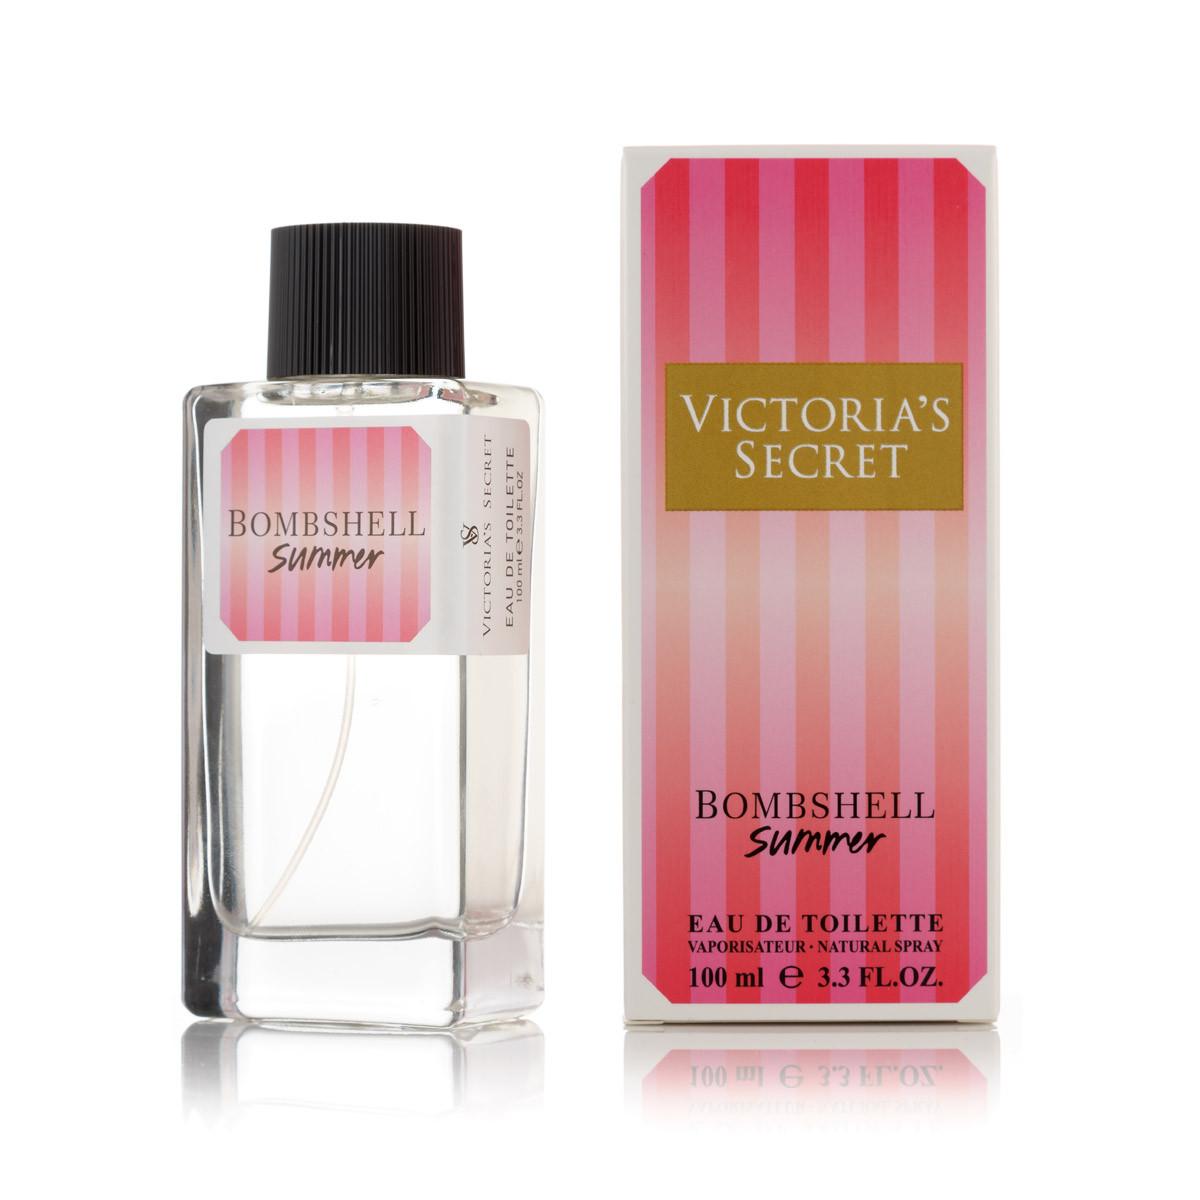 100 мл туалетная вода Victoria's Secret  Bombshell Summer (Ж)